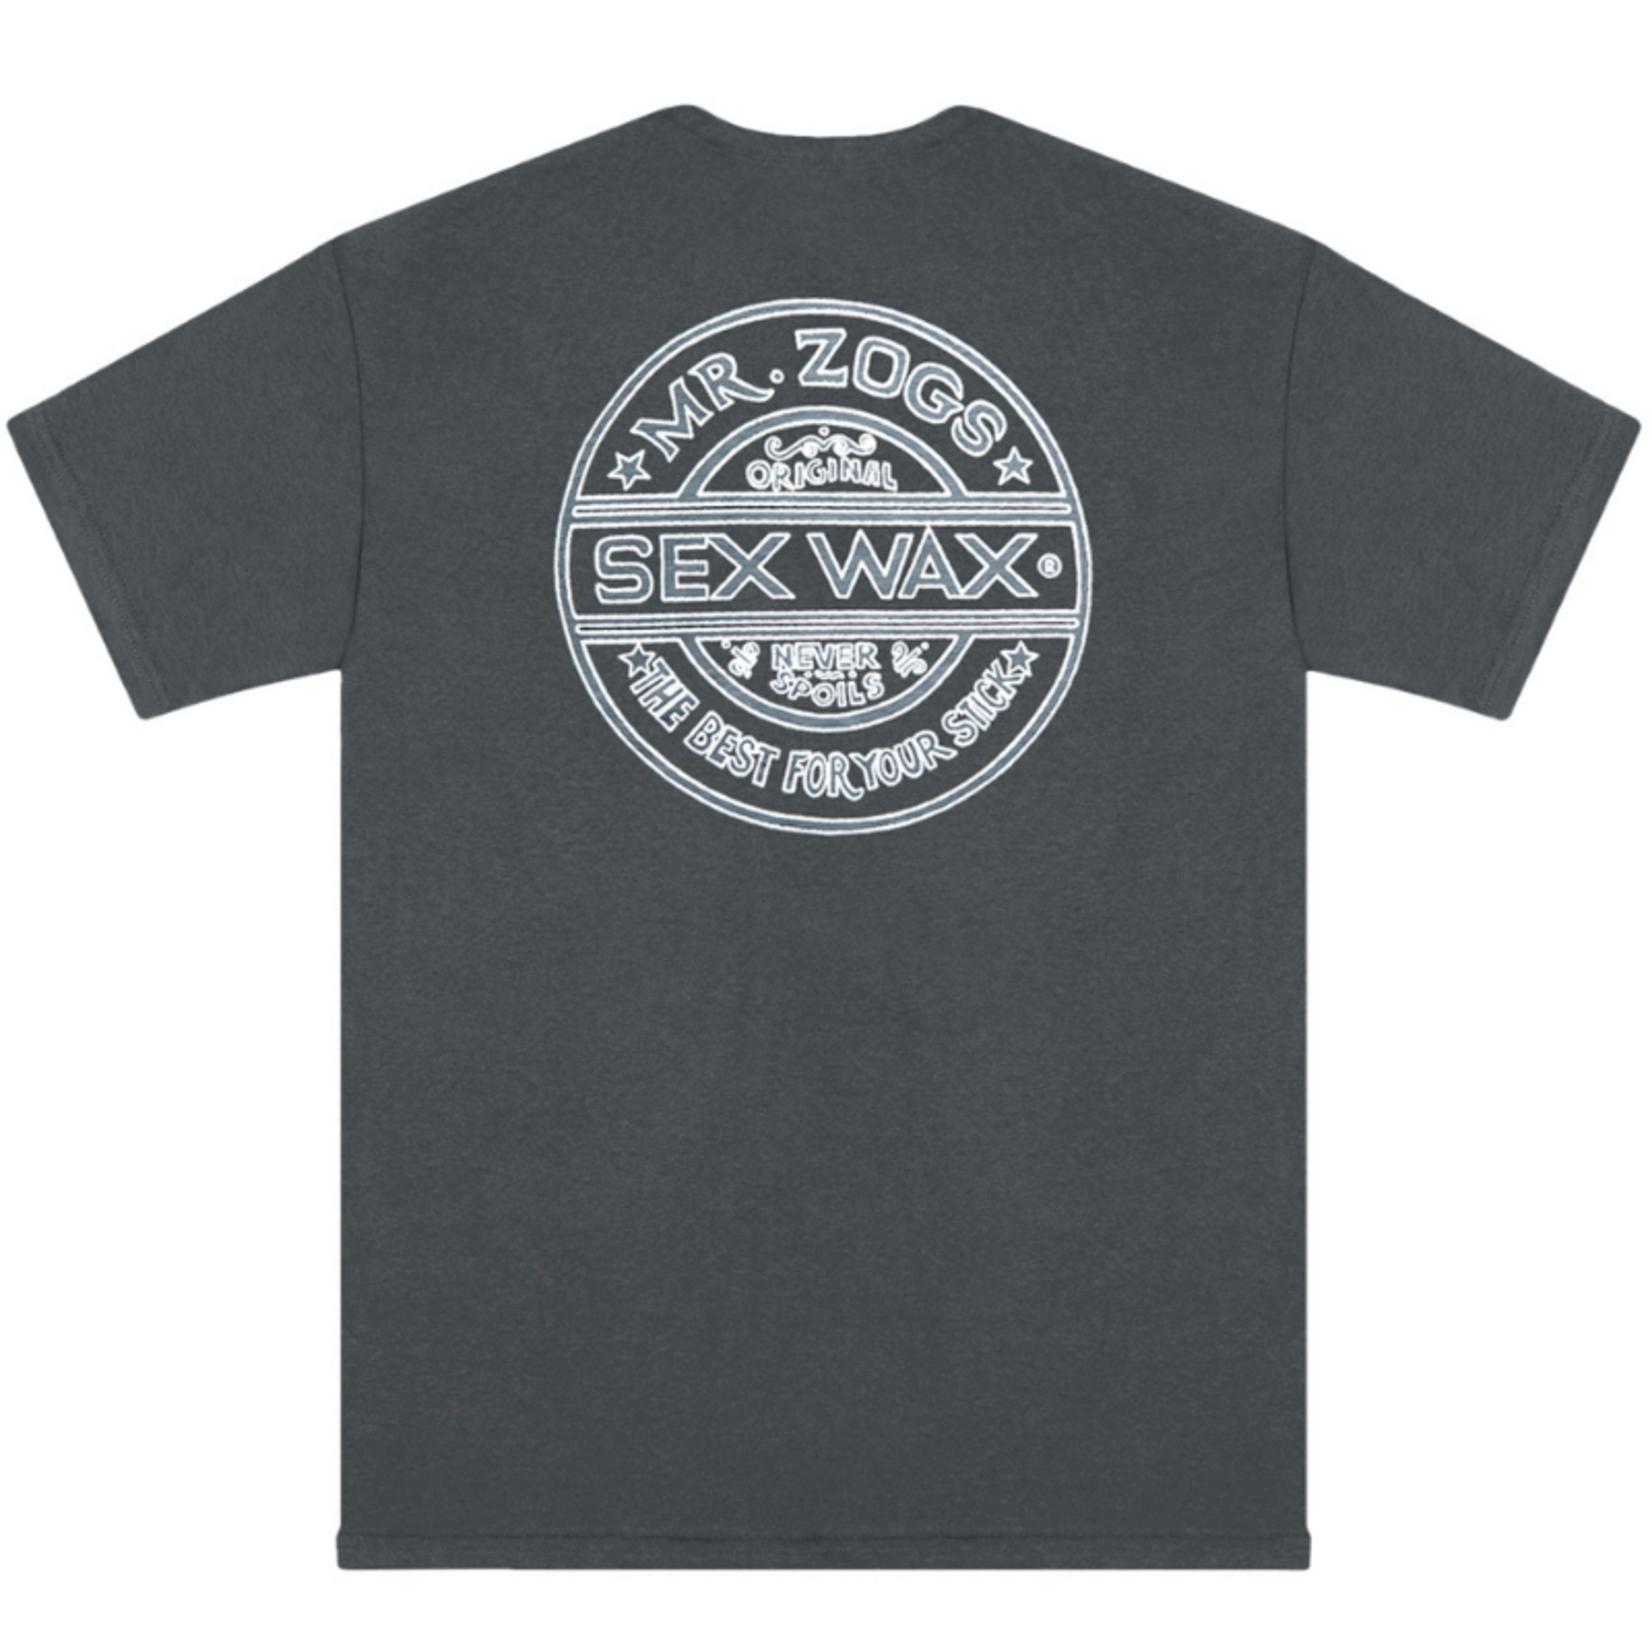 SEX WAX Sex wax T-Shirt Comfort Fit.